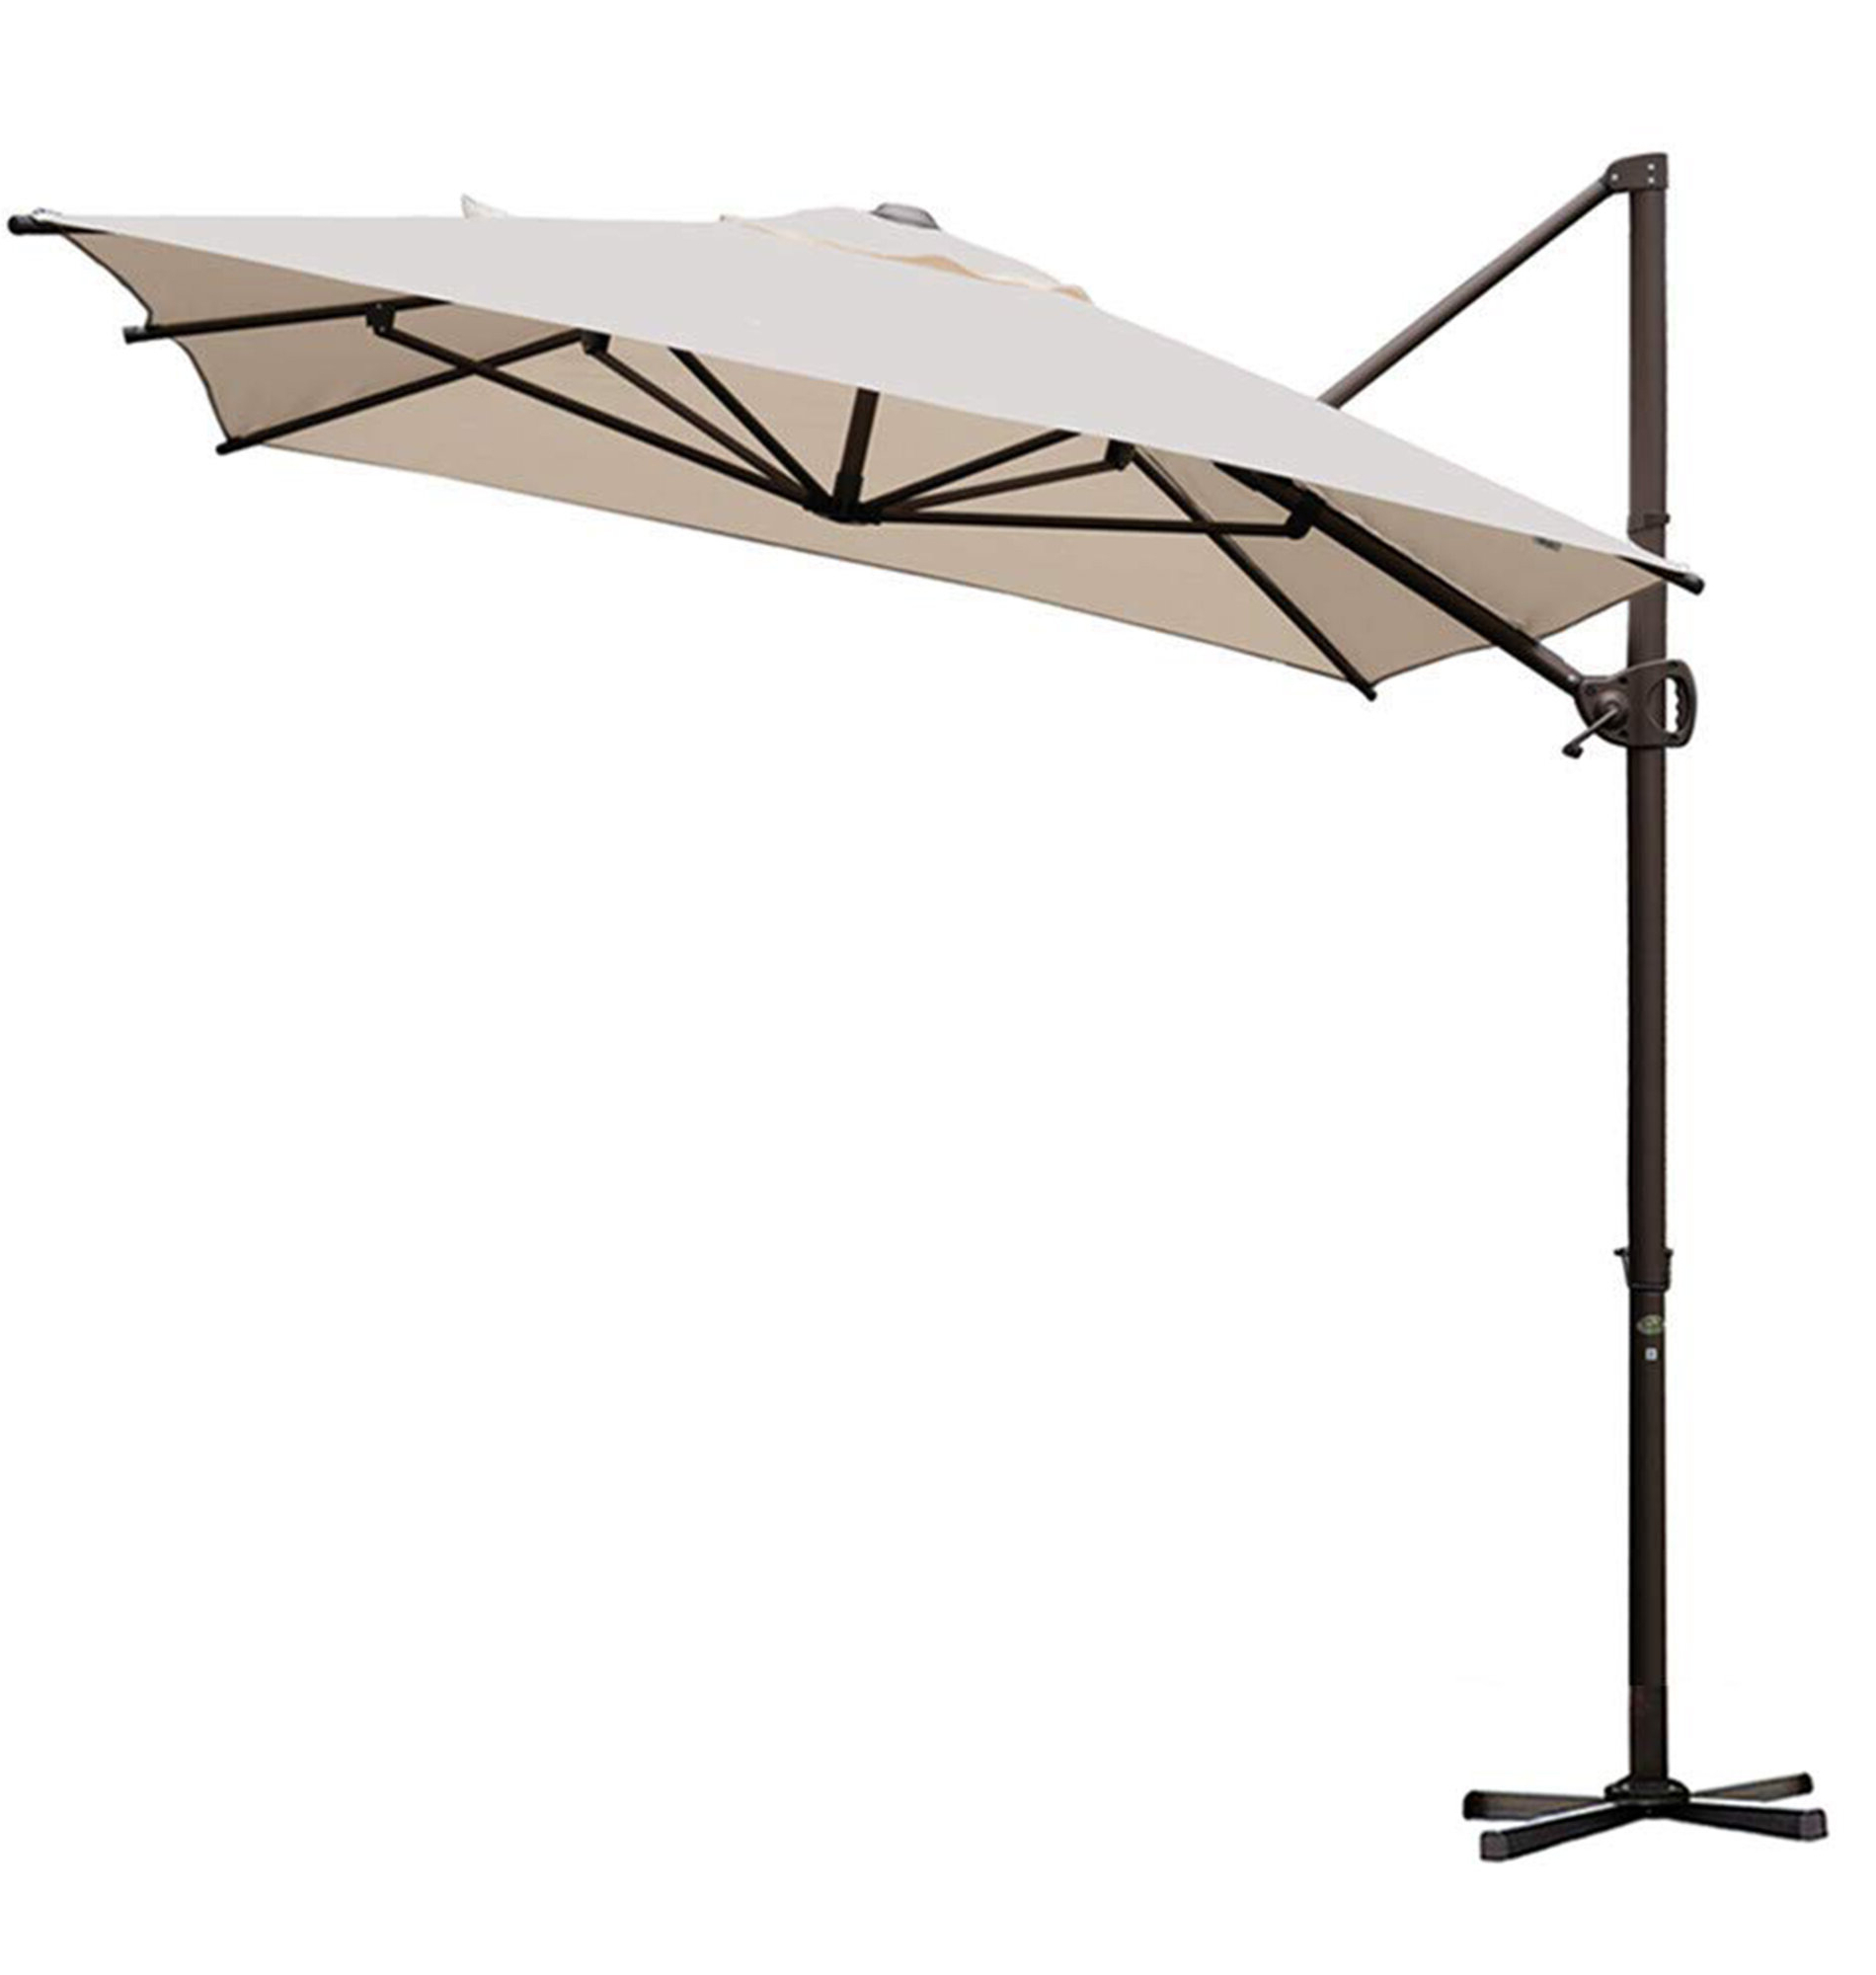 Fordwich  Rectangular Cantilever Umbrellas Throughout Most Popular Walter 9' X 7' Rectangular Cantilever Umbrella (View 11 of 20)